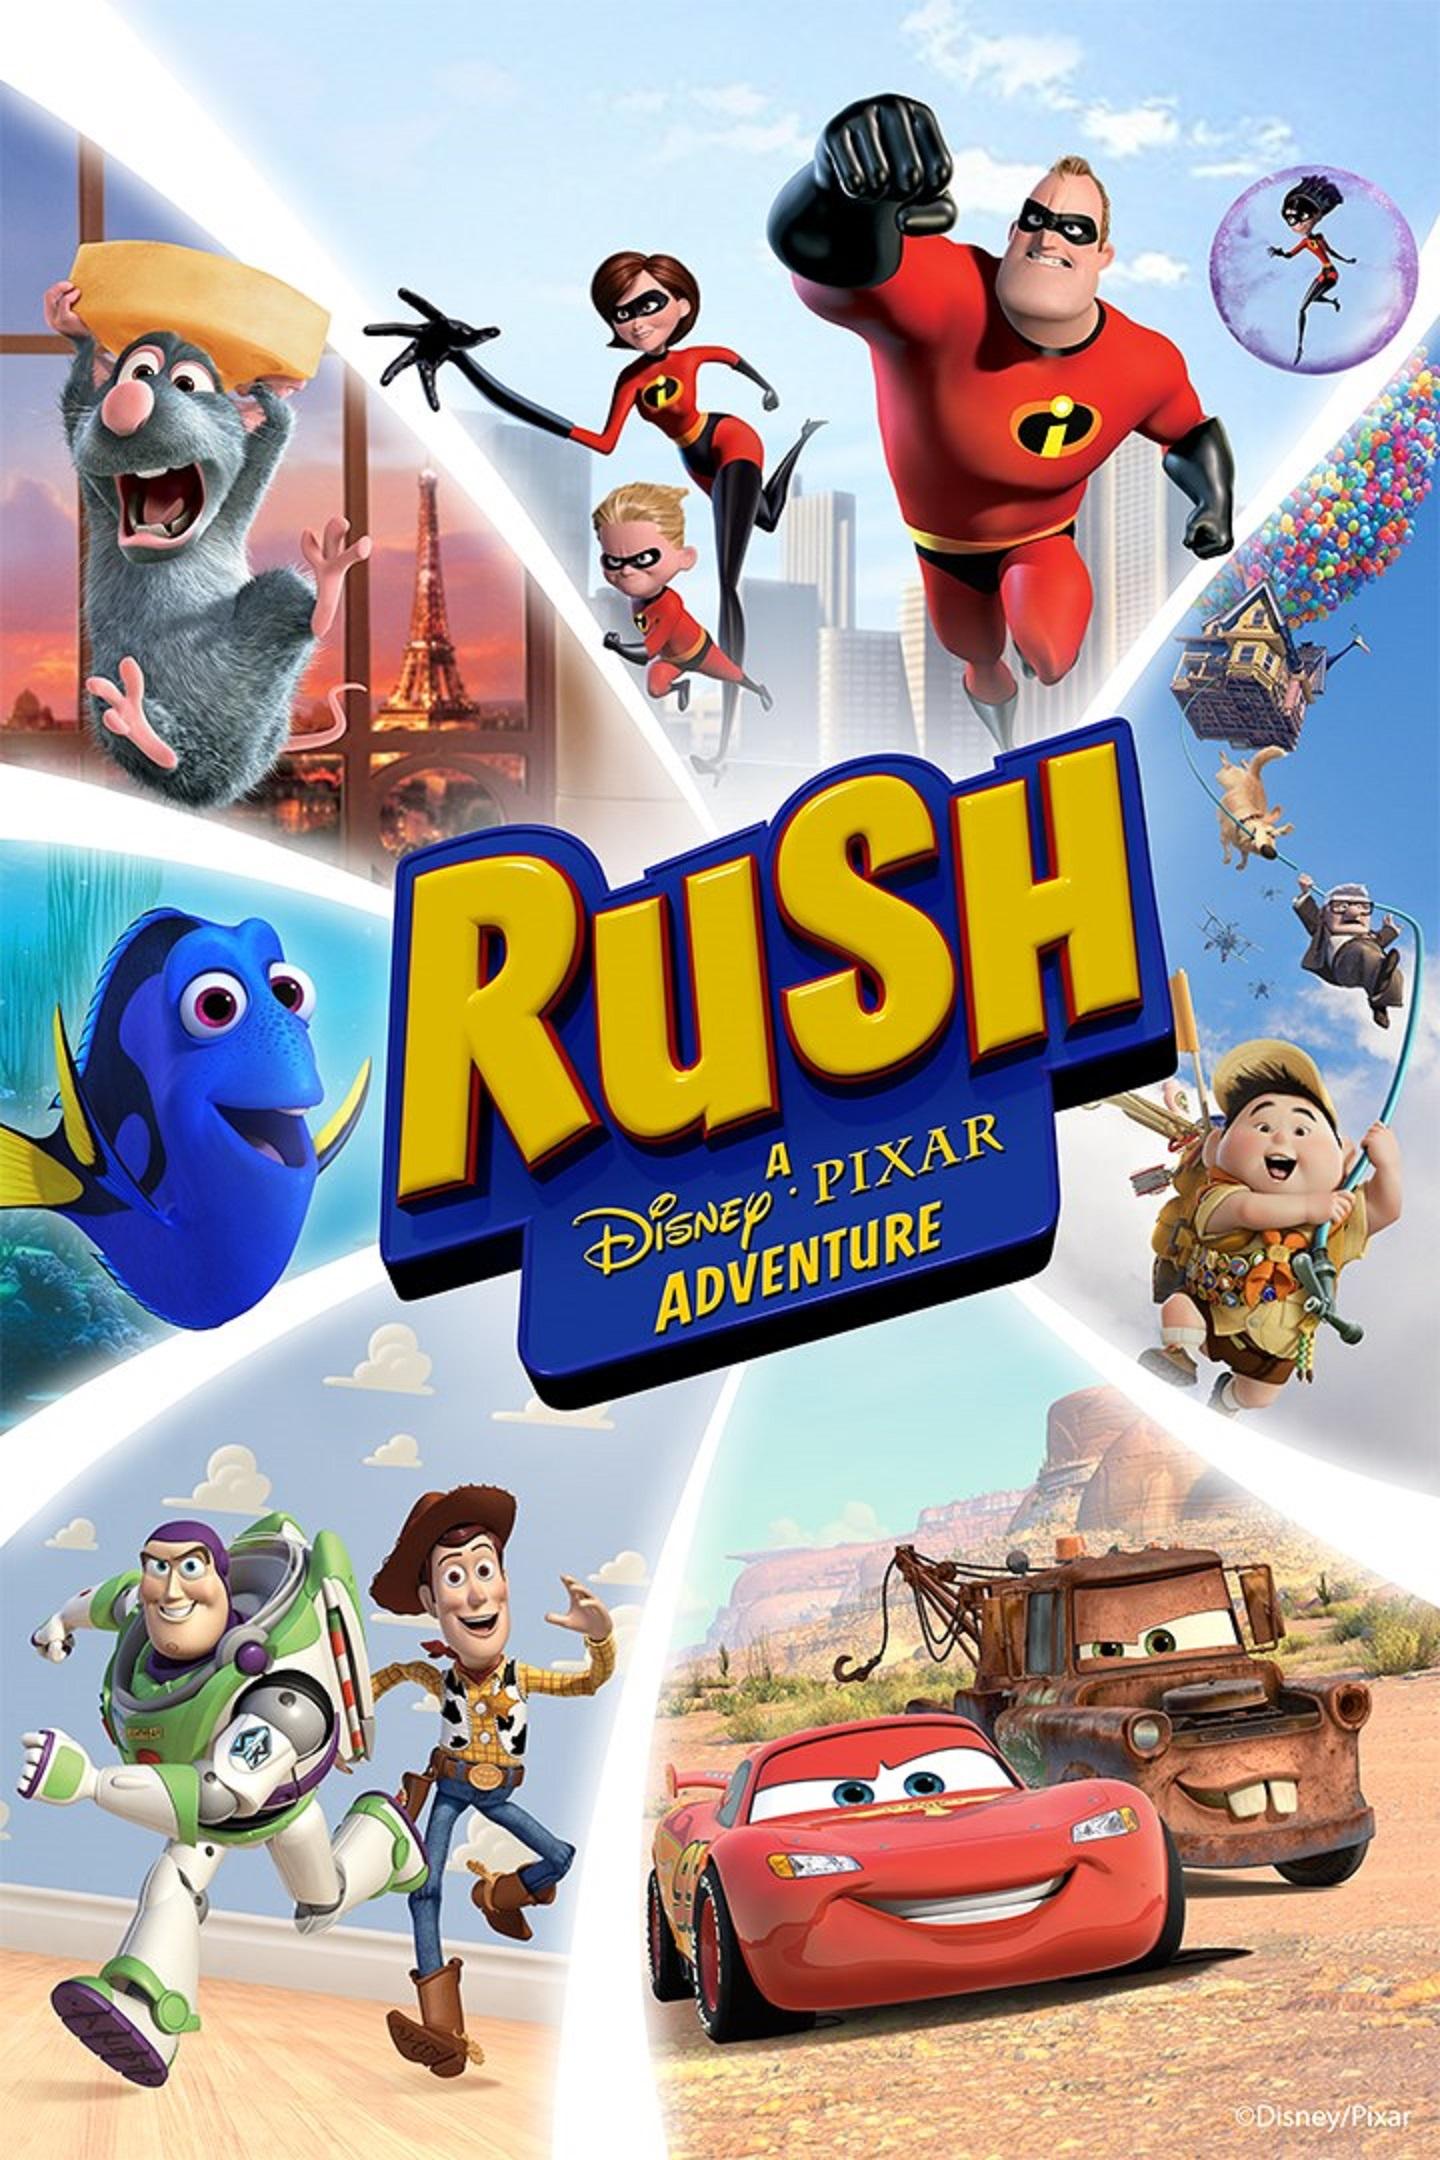 Rush: A Disney-Pixar Adventure